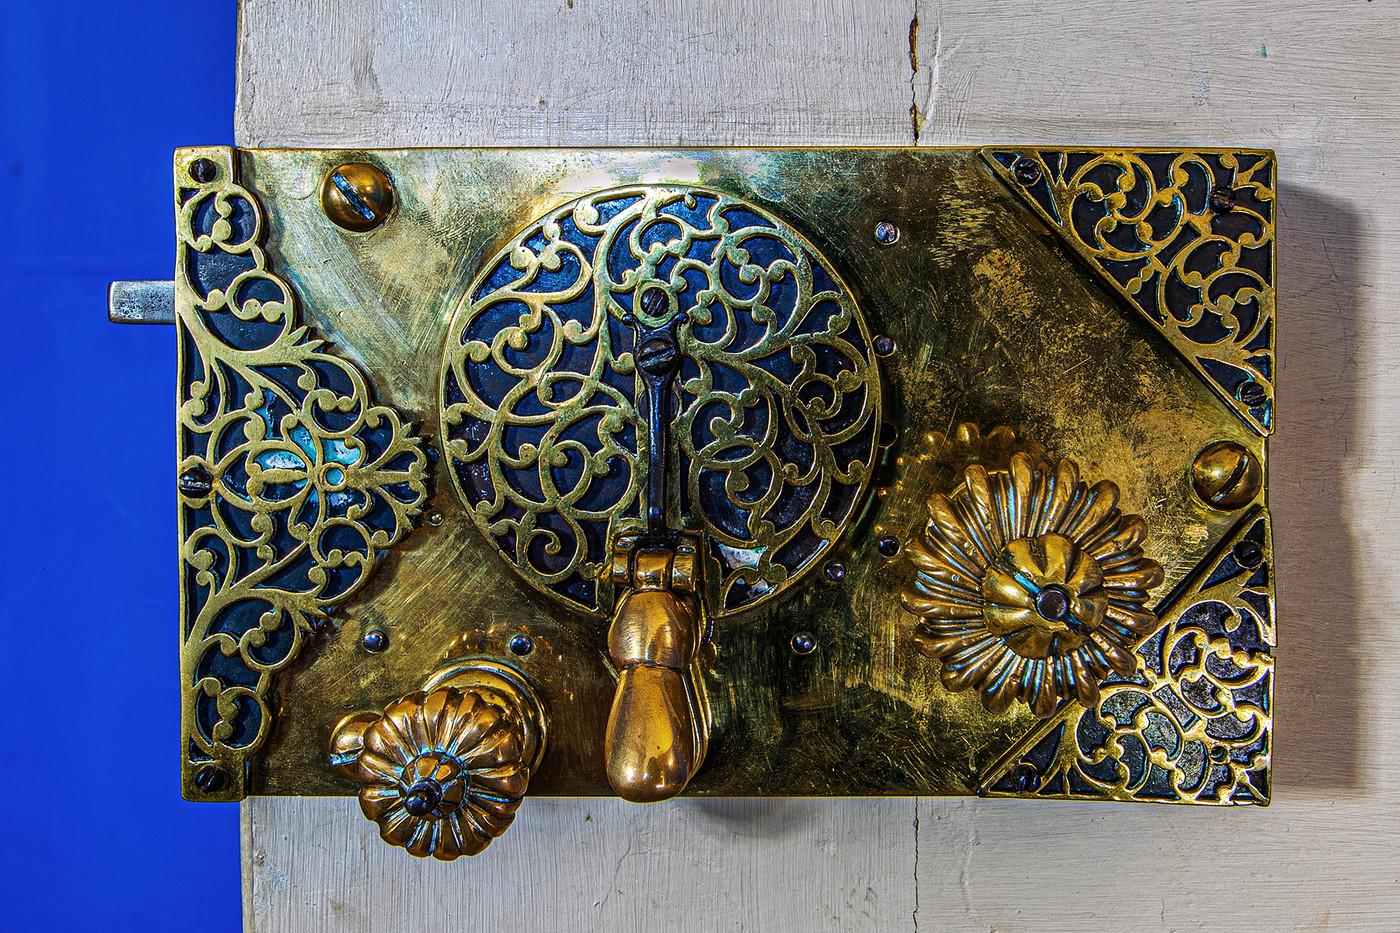 18 DOOR LOCK DETAIL BLUE BEDROOM STRAWBERRY HILL HOUSE by Philip Easom